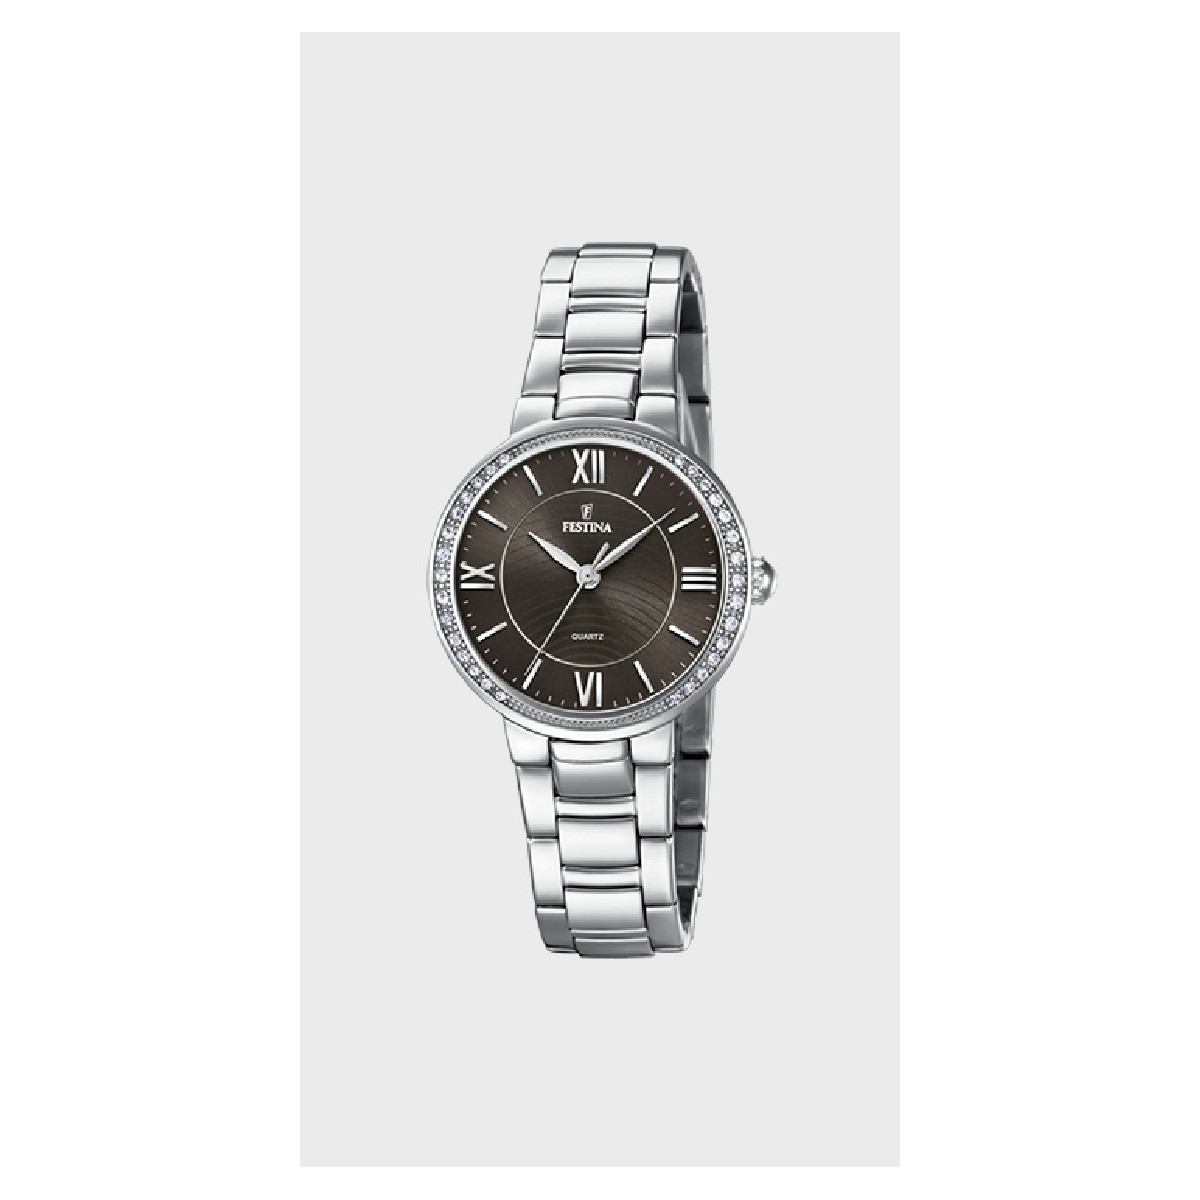 Reloj Festina - F20220-2